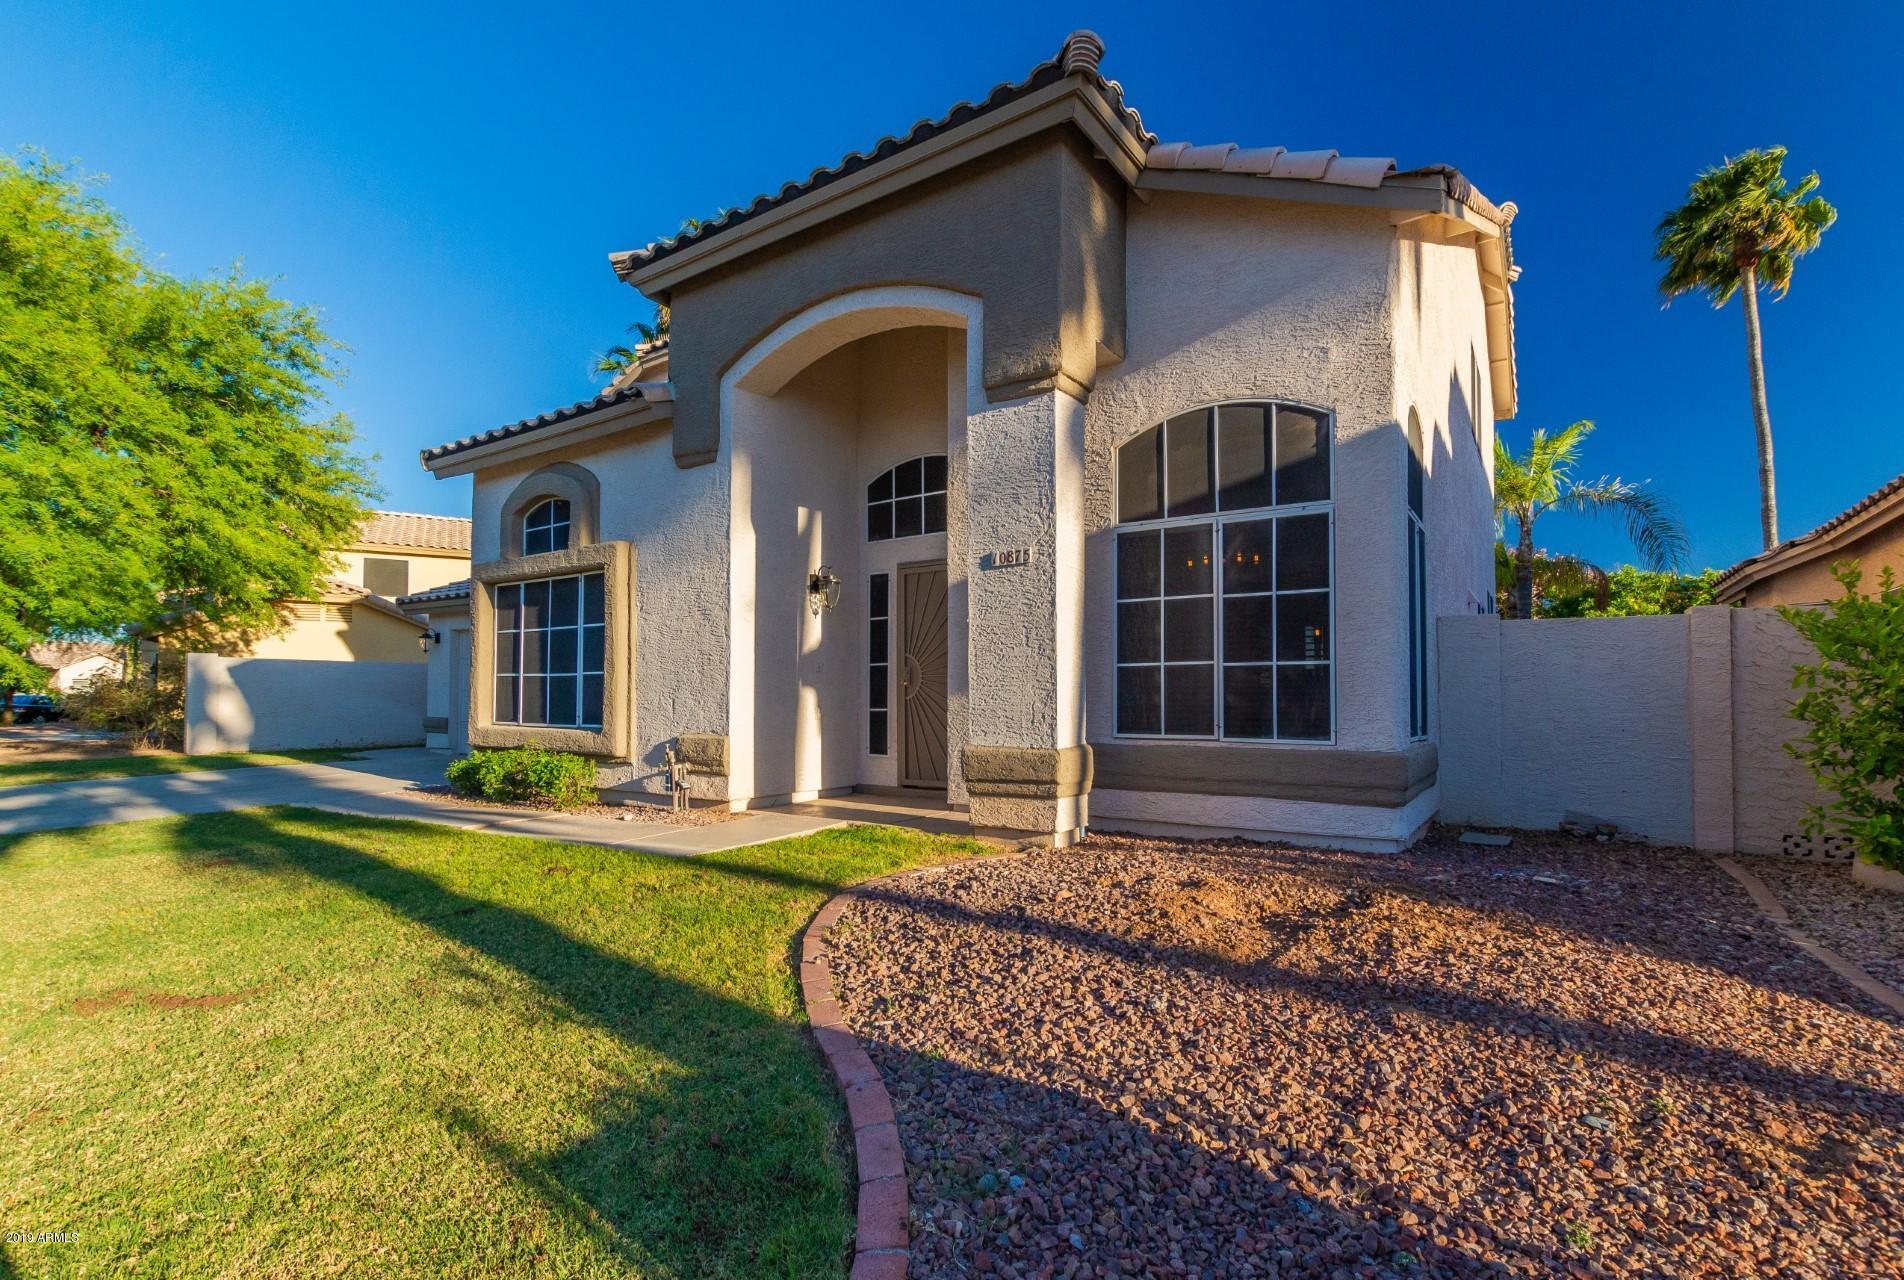 MLS 5913838 10875 W LAURELWOOD Lane, Avondale, AZ 85392 Avondale AZ Private Pool